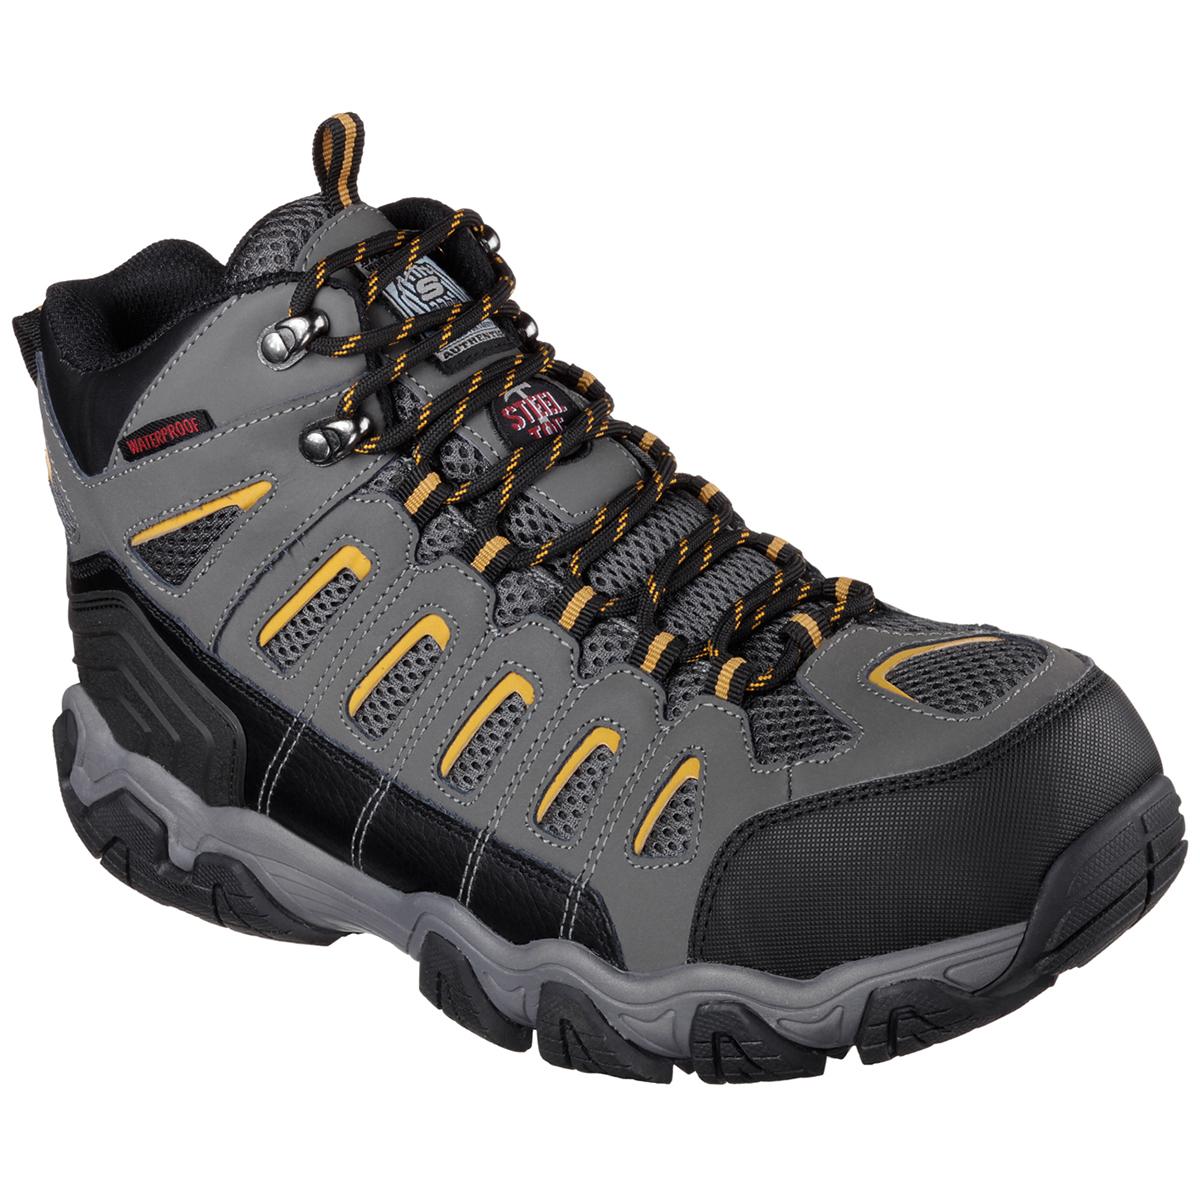 Skechers Men's Blais Bixford Steel Toe Work Shoes - Black, 11.5